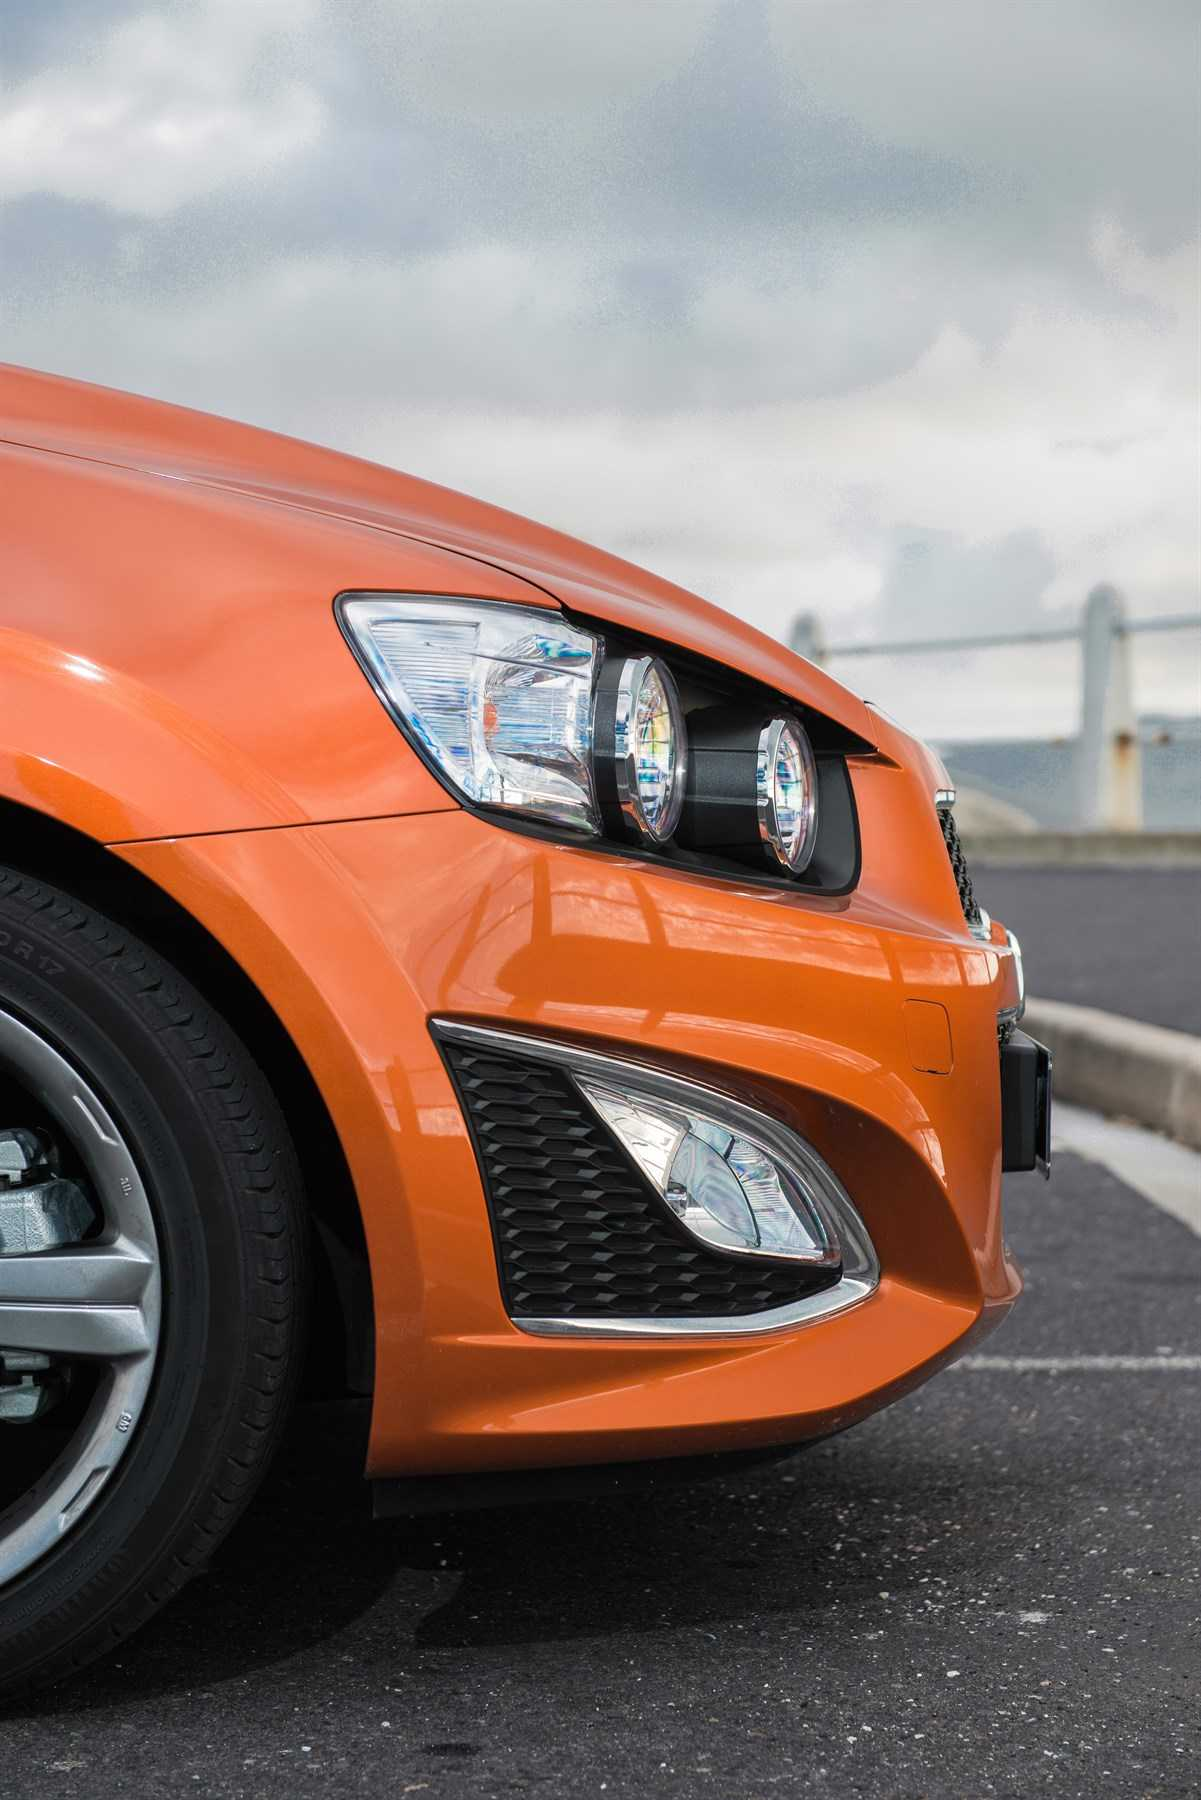 Chevrolet Sonic 1.4 Manual, 140hp, 2016